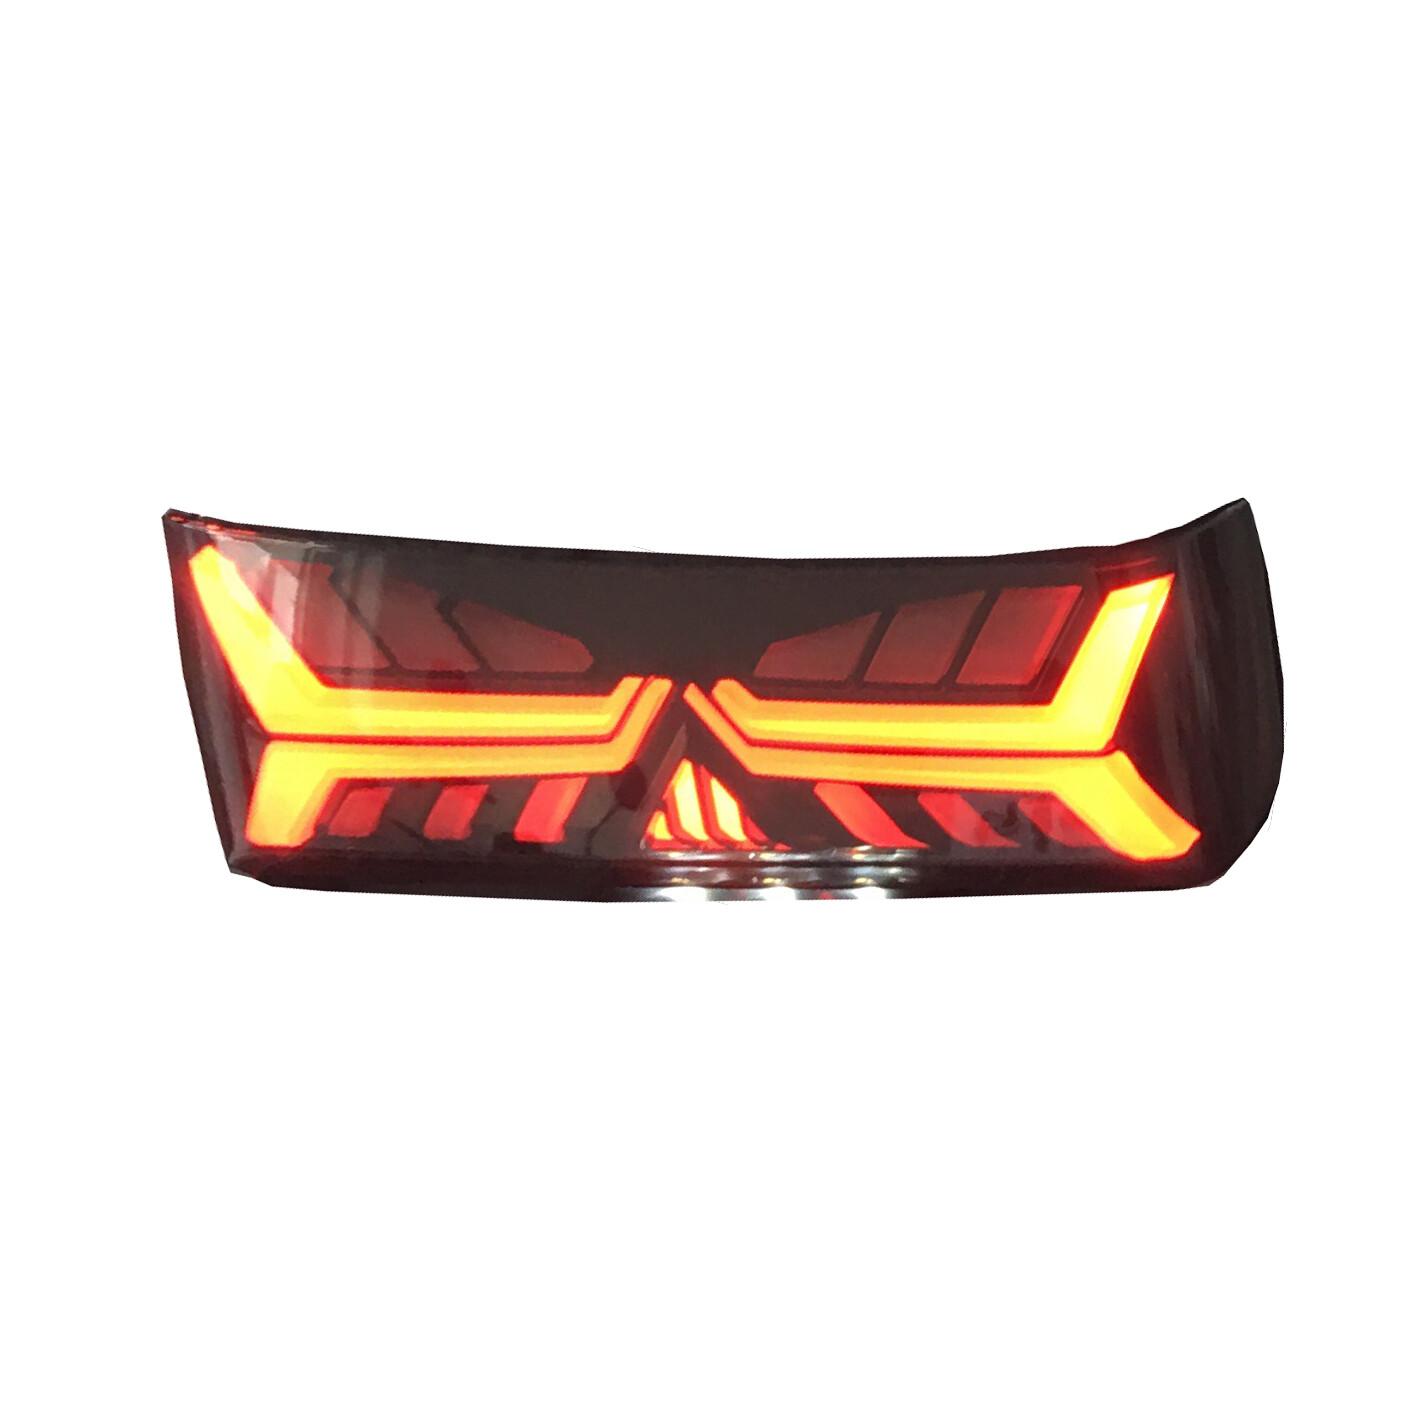 LED Rückscheinwerfer für NIU N Serie